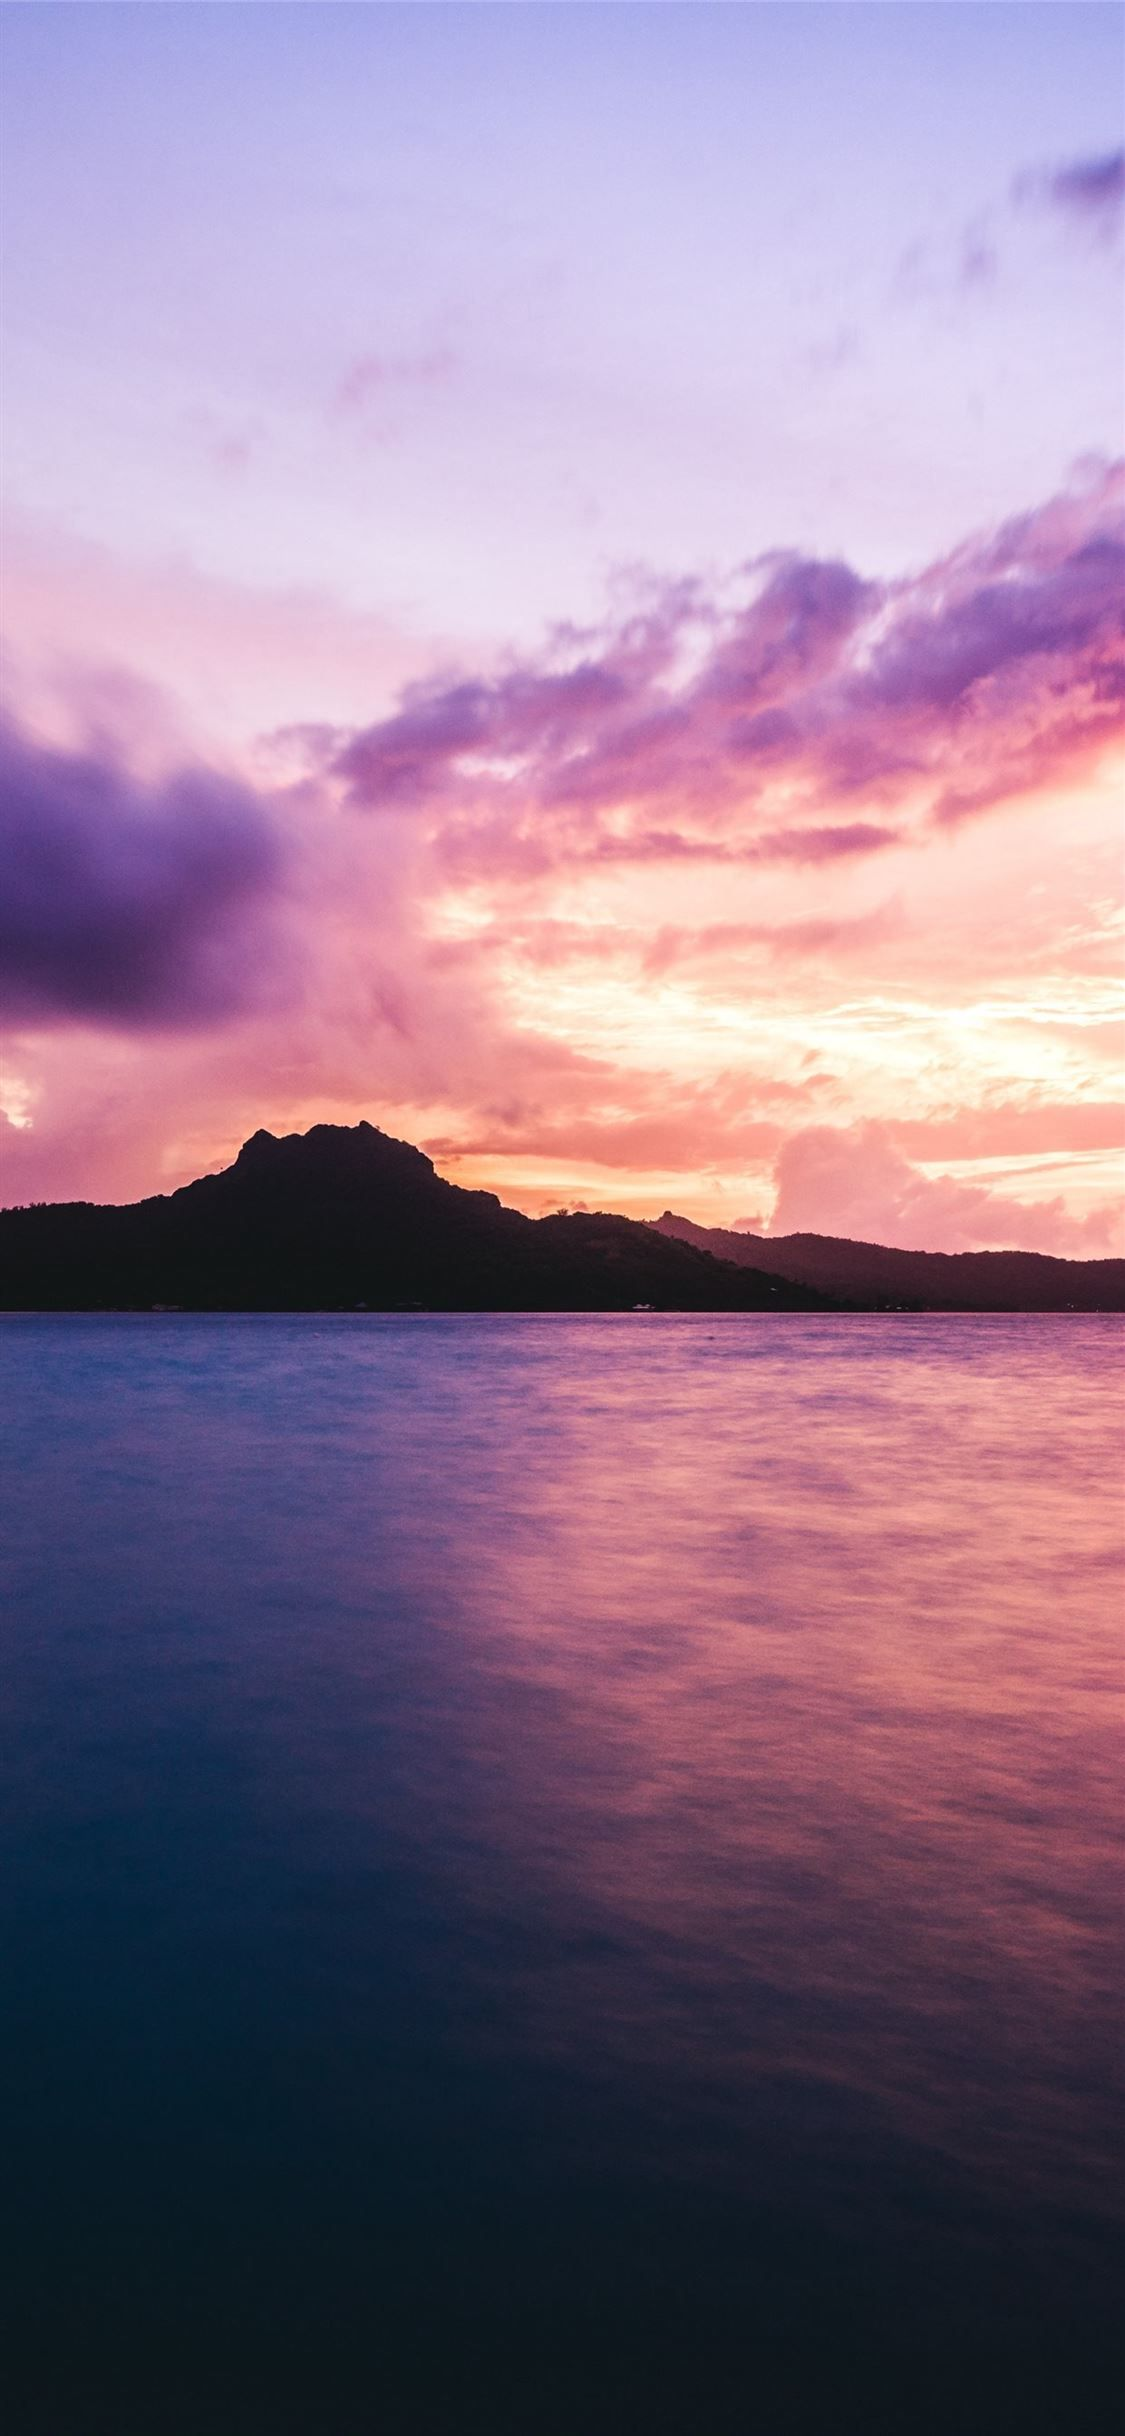 Ocean Rocks Clouds Bora Bora Borabora 100mostbeautifulplacestovisit Frenchpolynesia Iphone11wallpaper Clouds Bora Bora Wallpaper